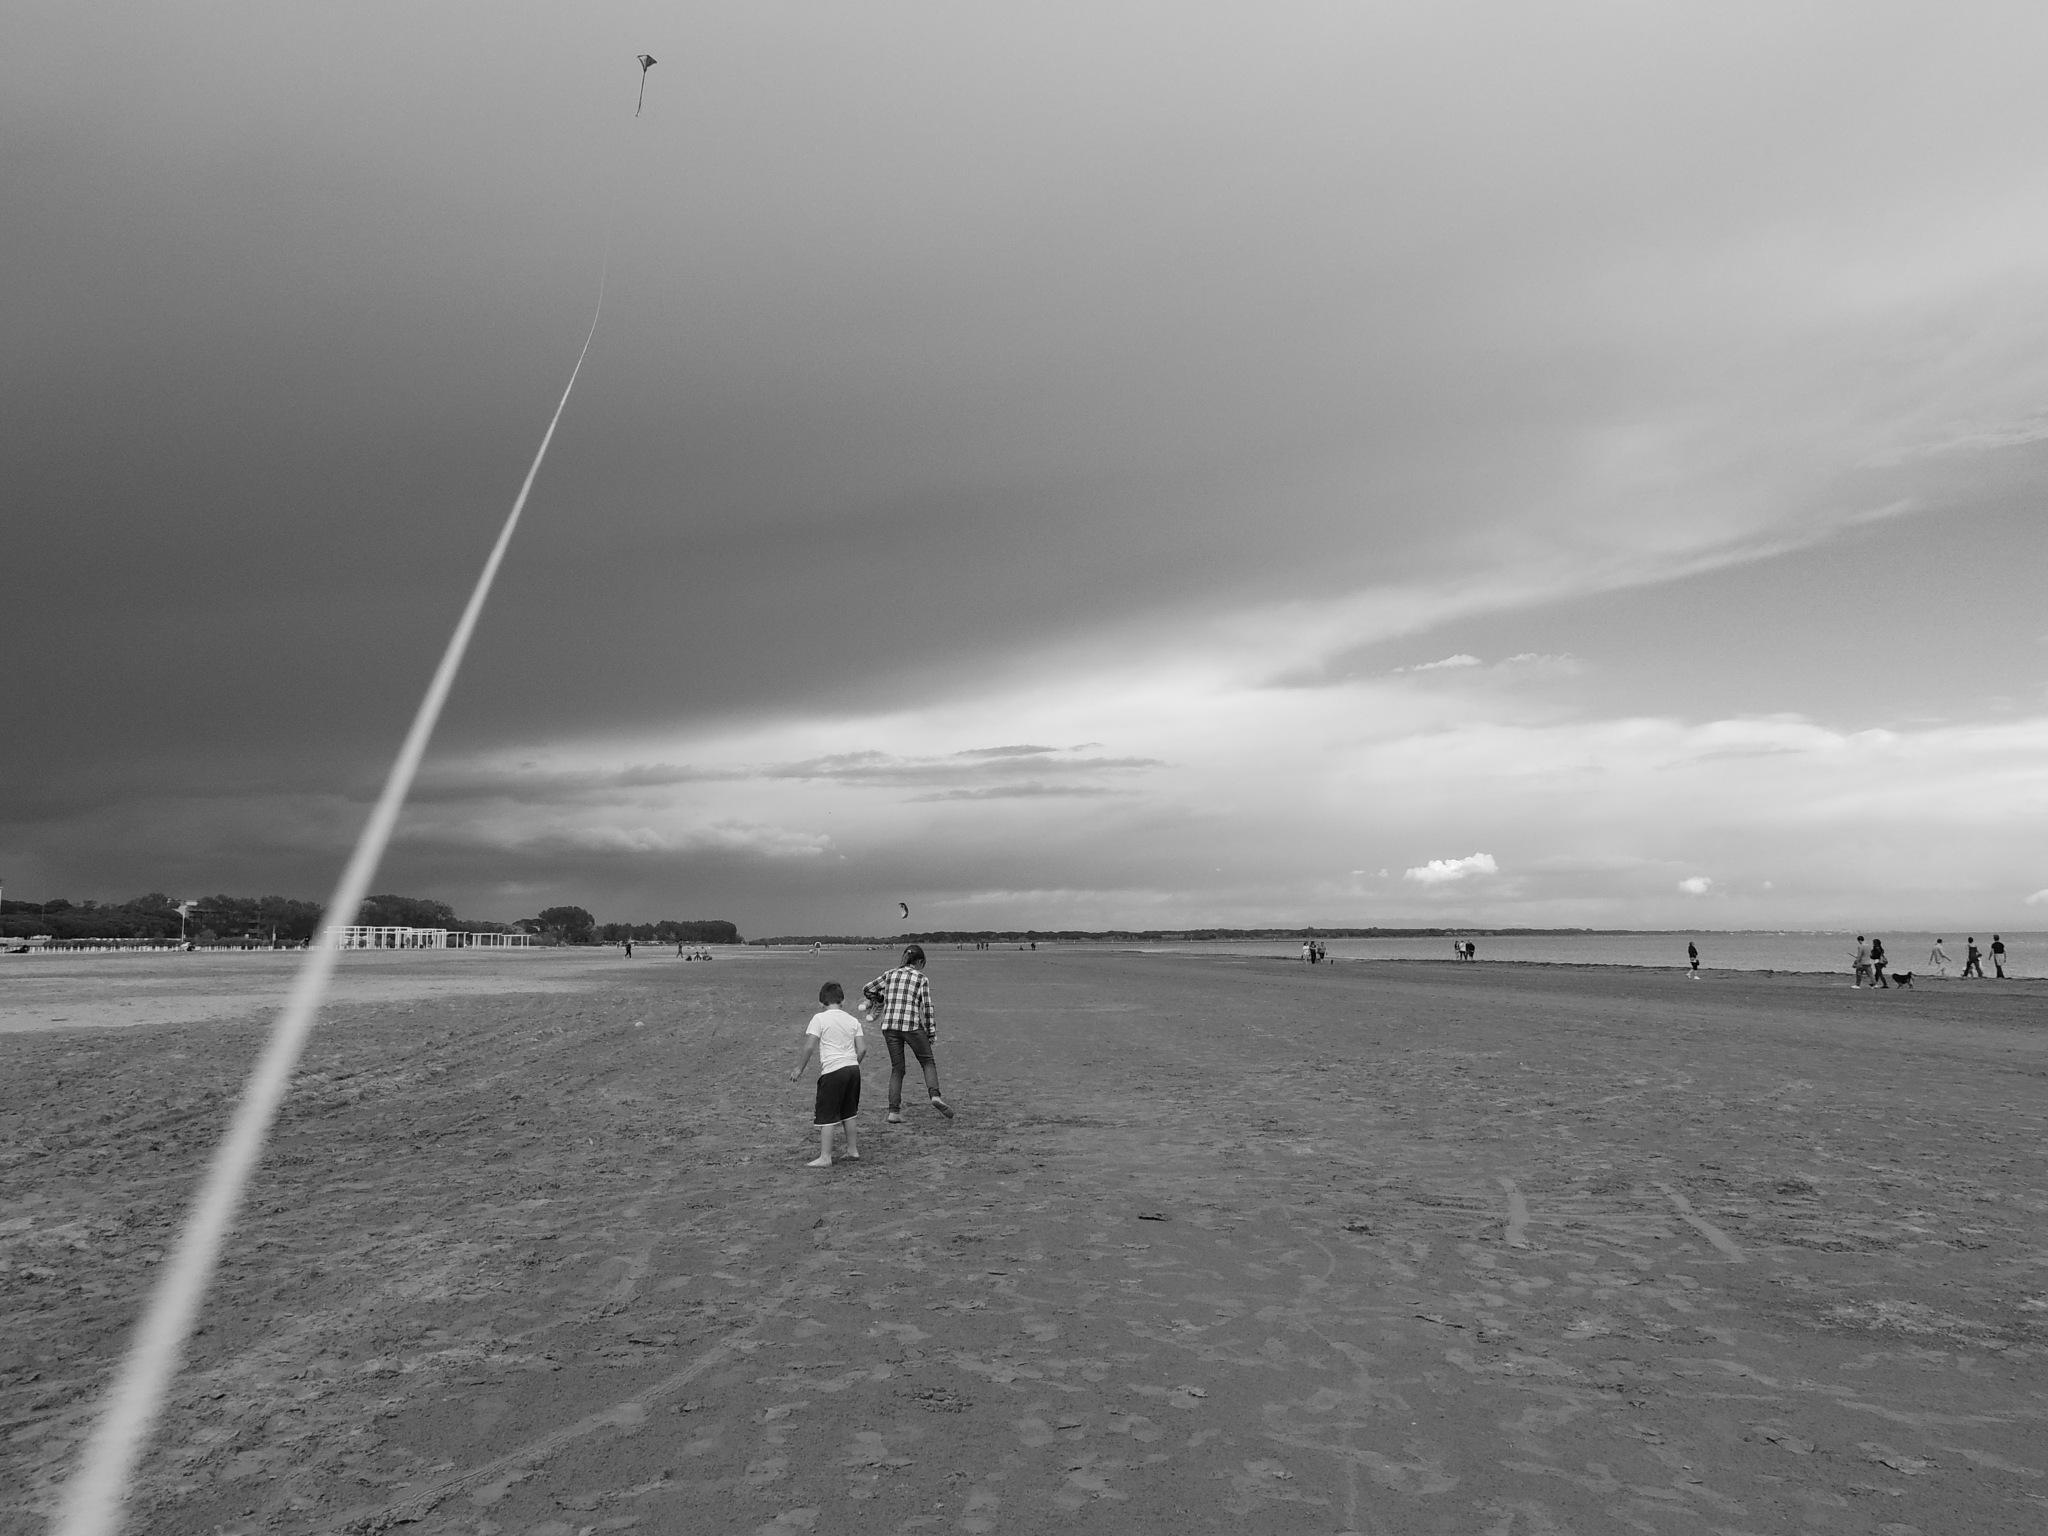 Kite in the sky by Damiano Mozzato